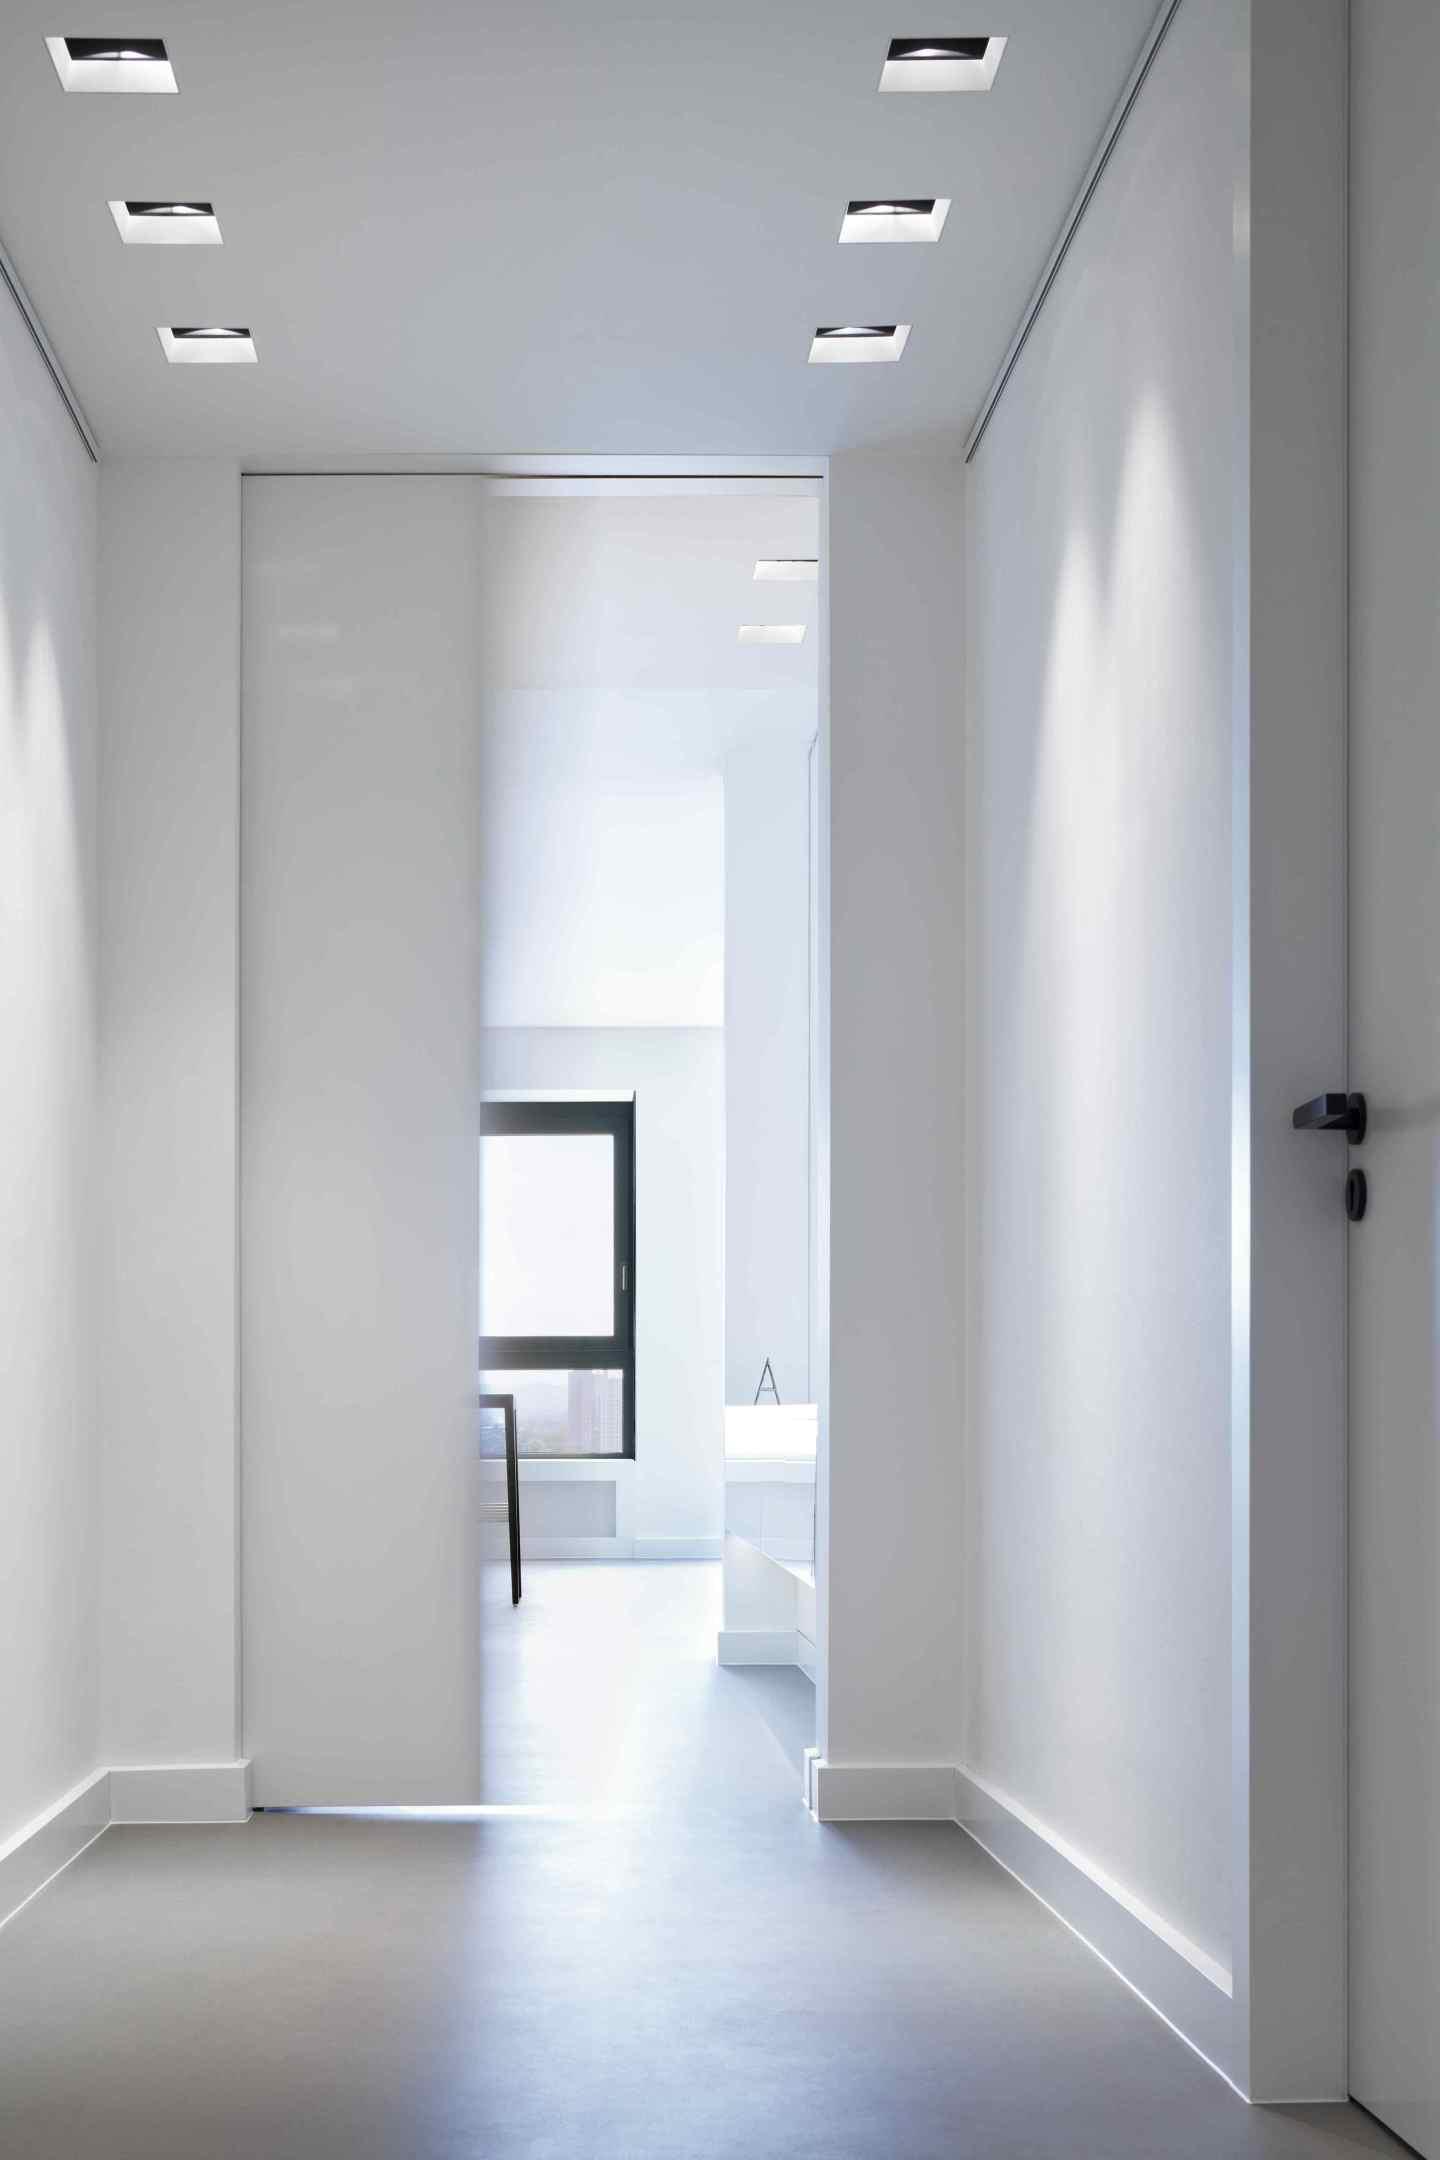 luxus dunklen flur heller gestalten fotos erindzain. Black Bedroom Furniture Sets. Home Design Ideas